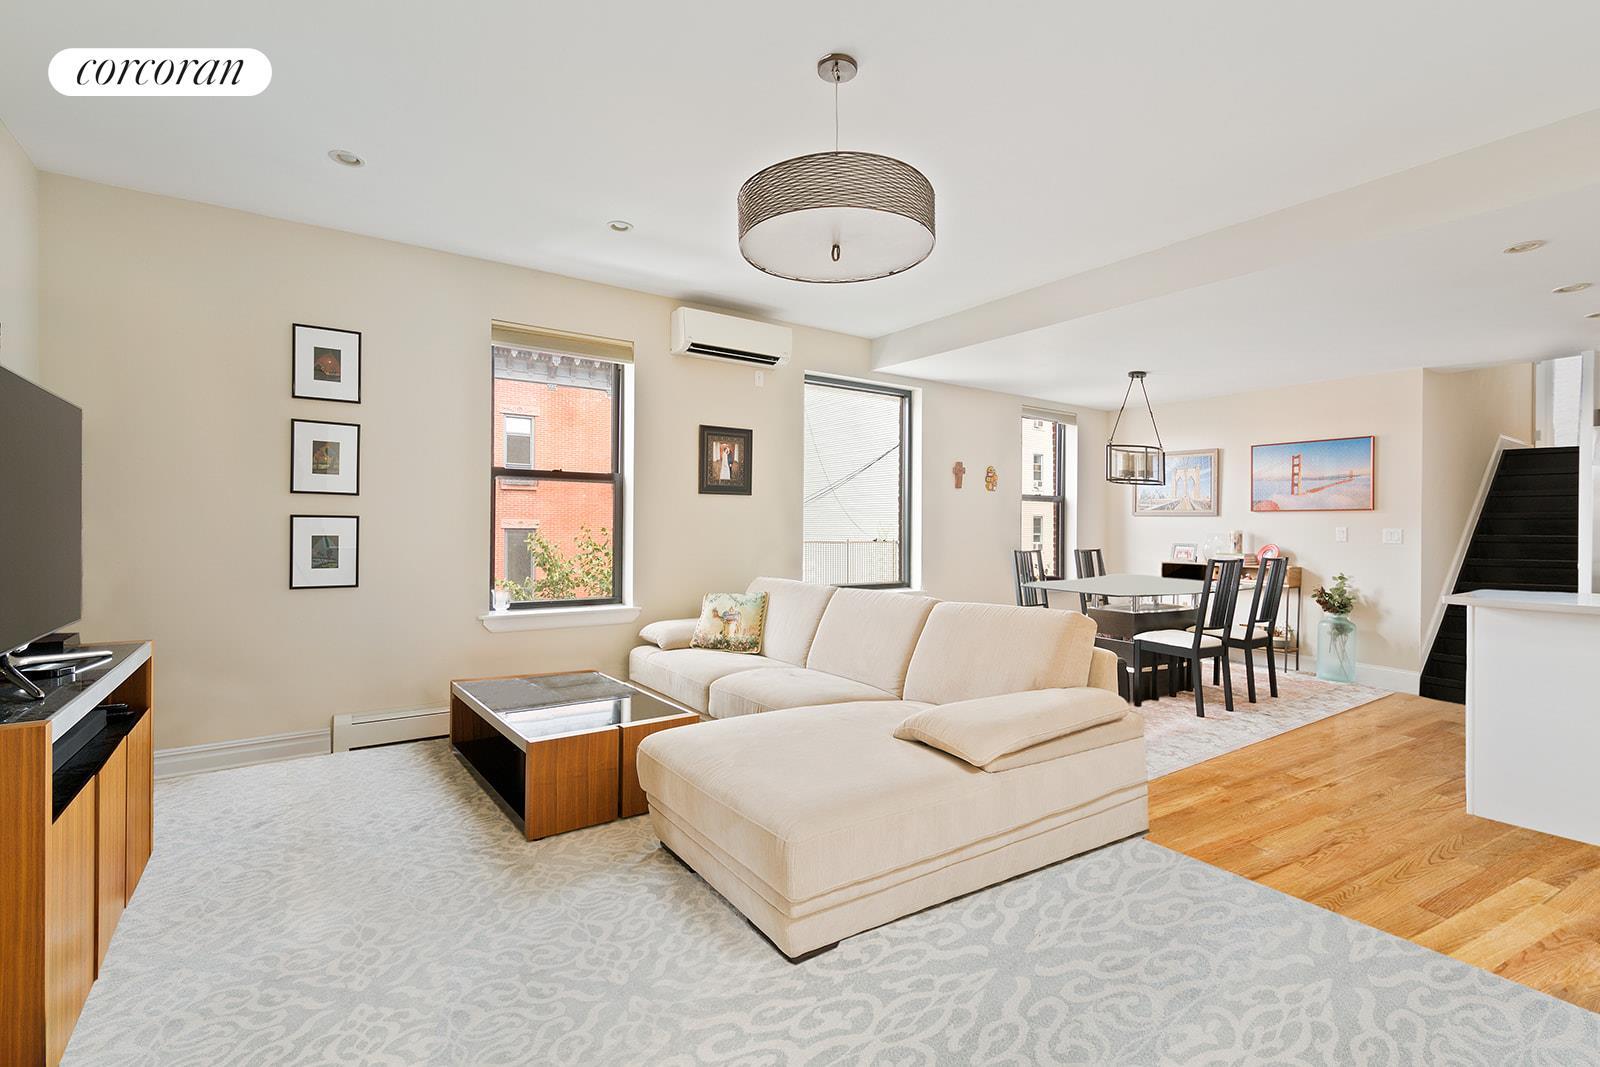 673 5th Avenue Greenwood Heights Brooklyn NY 11215